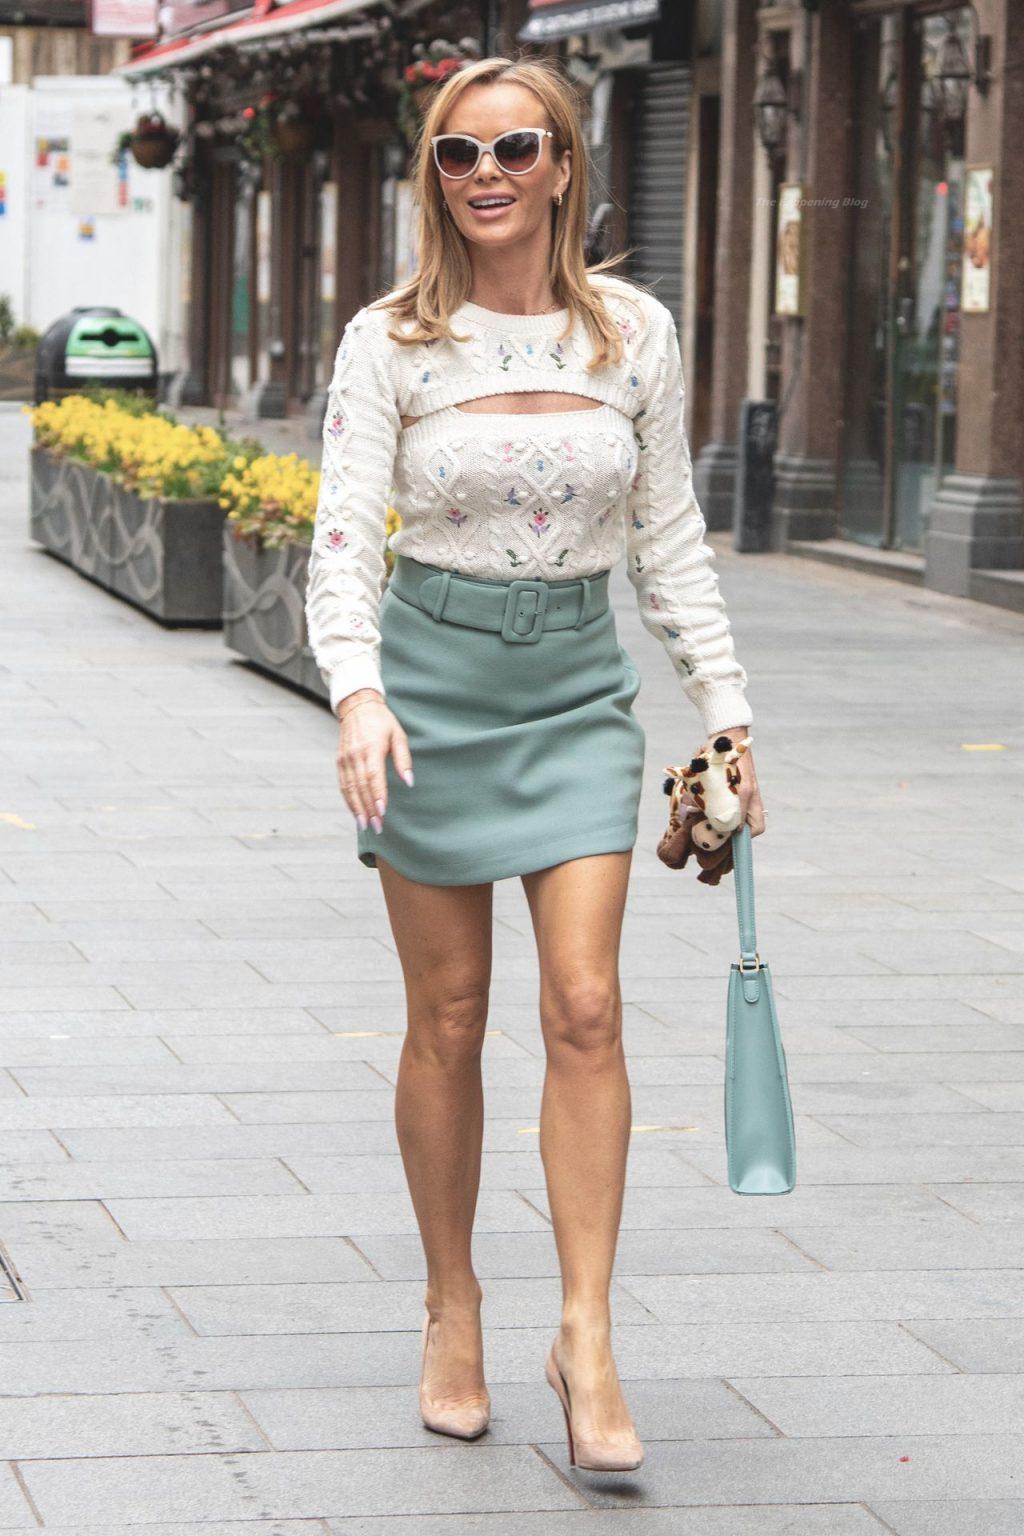 Amanda Holden is Seen Leaving Global Studios (113 Photos)